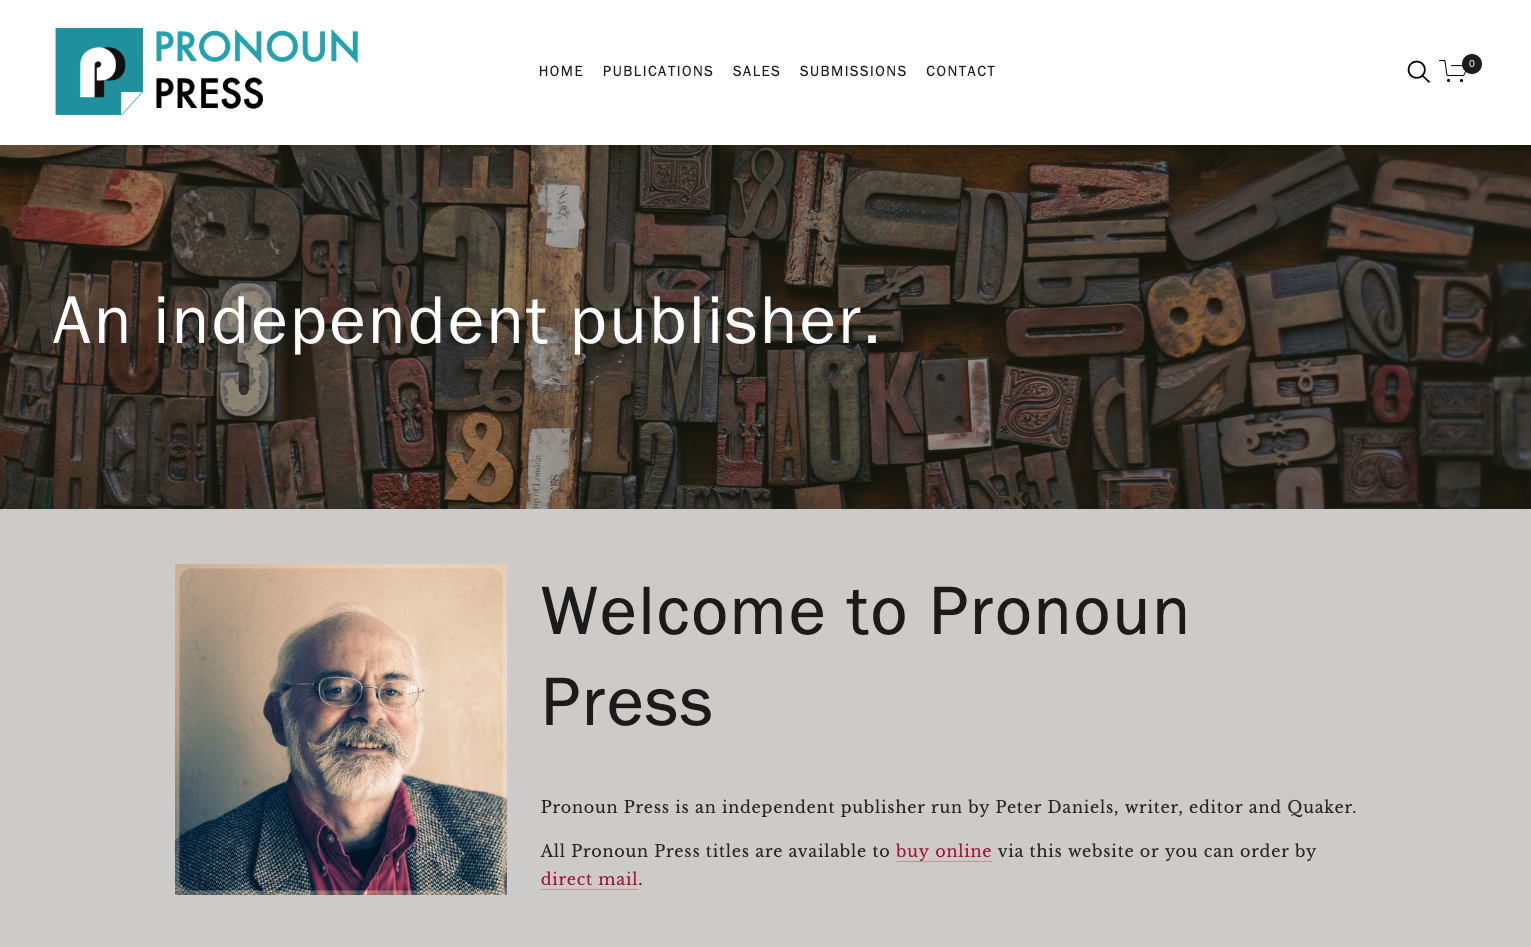 The new look Pronoun Press website.